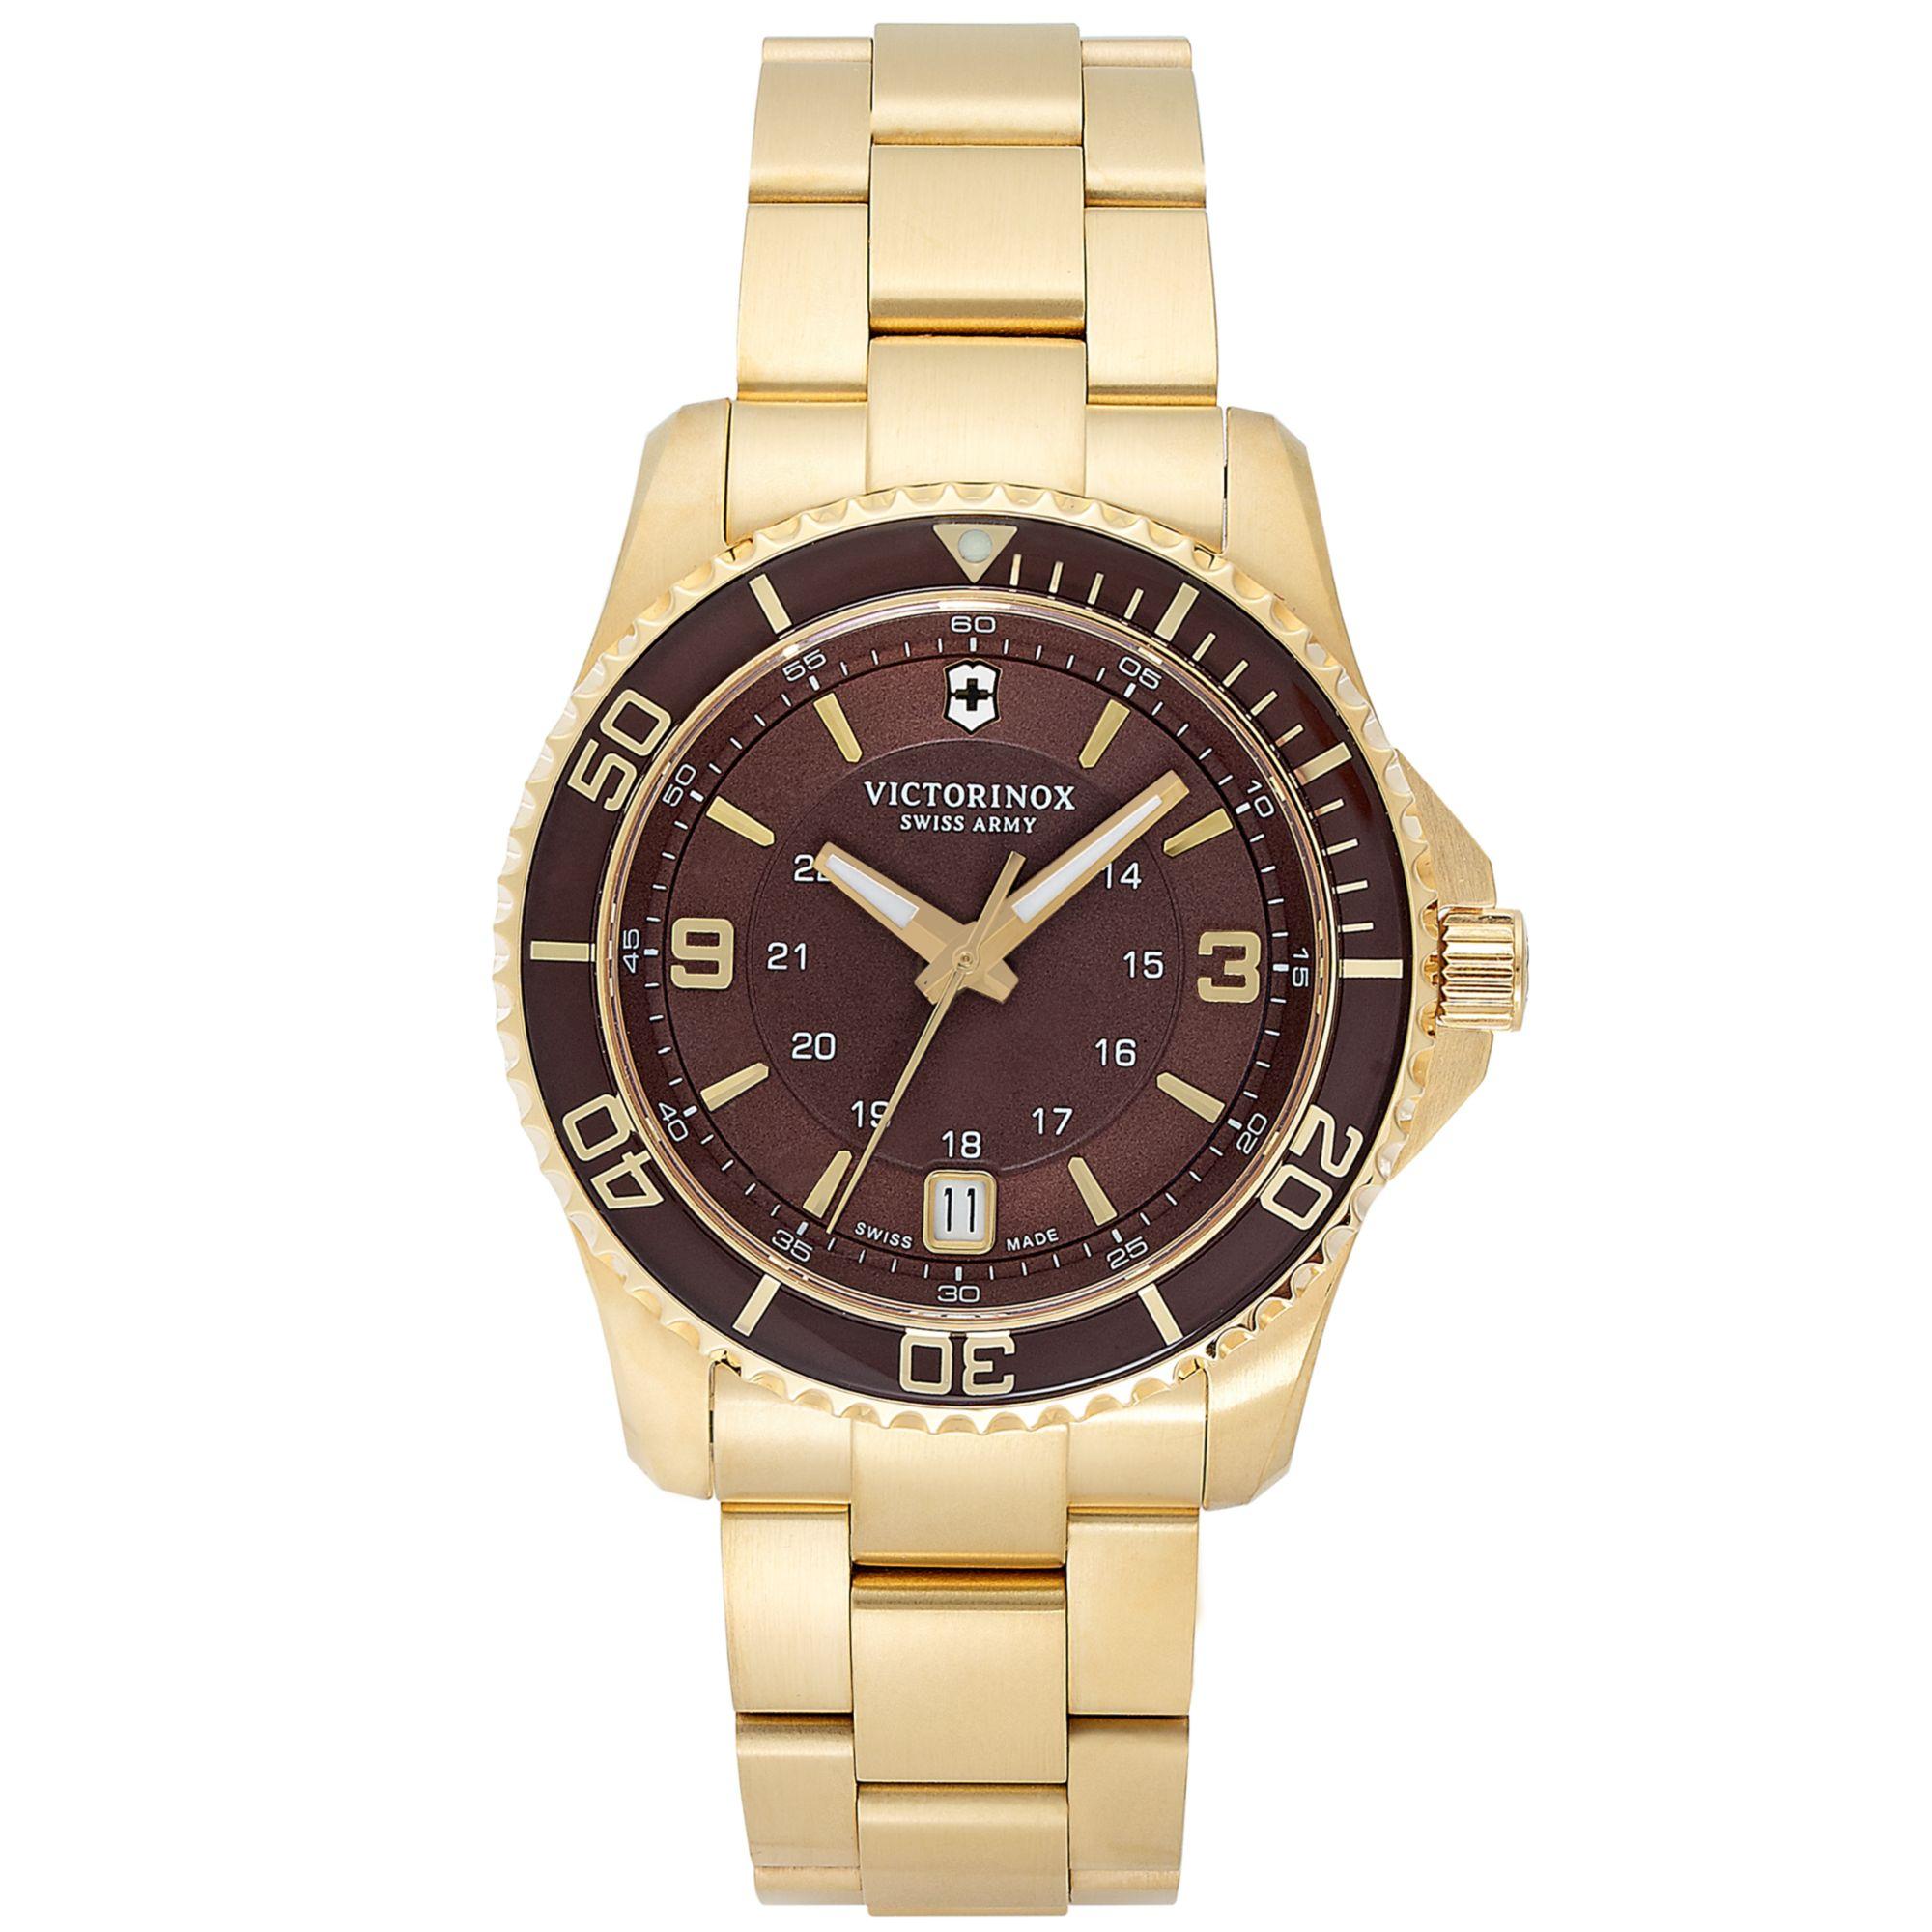 направления производстве victorinox swiss army watch price philippines золотой